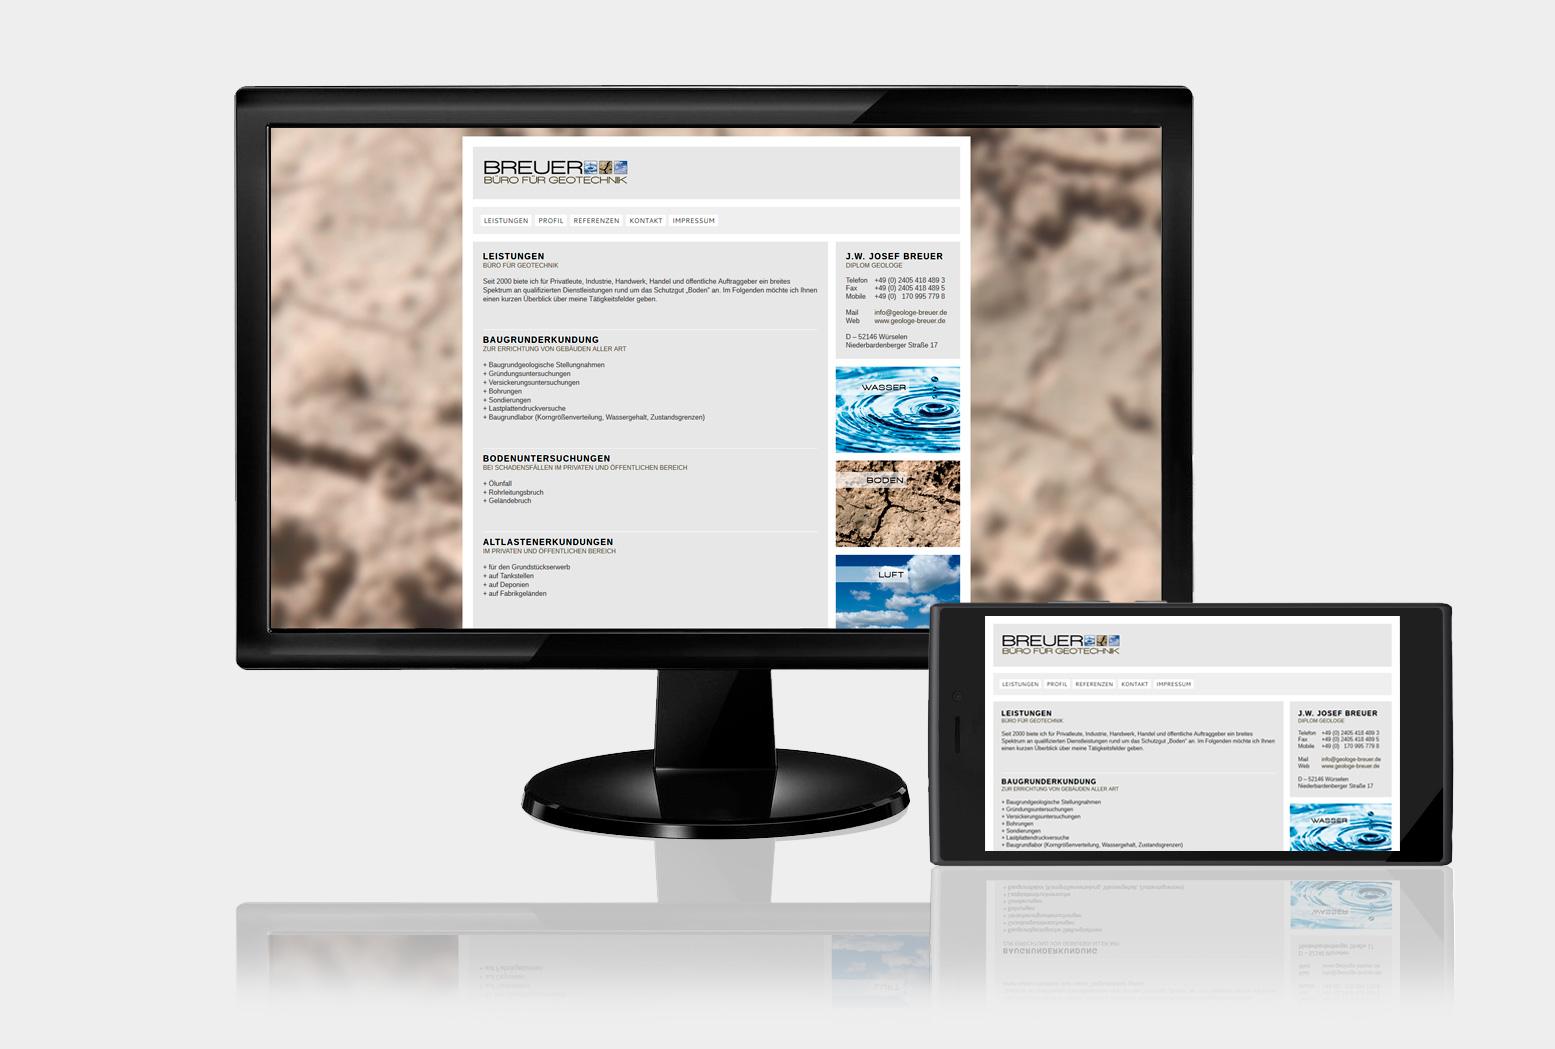 webdesign-03-breuer